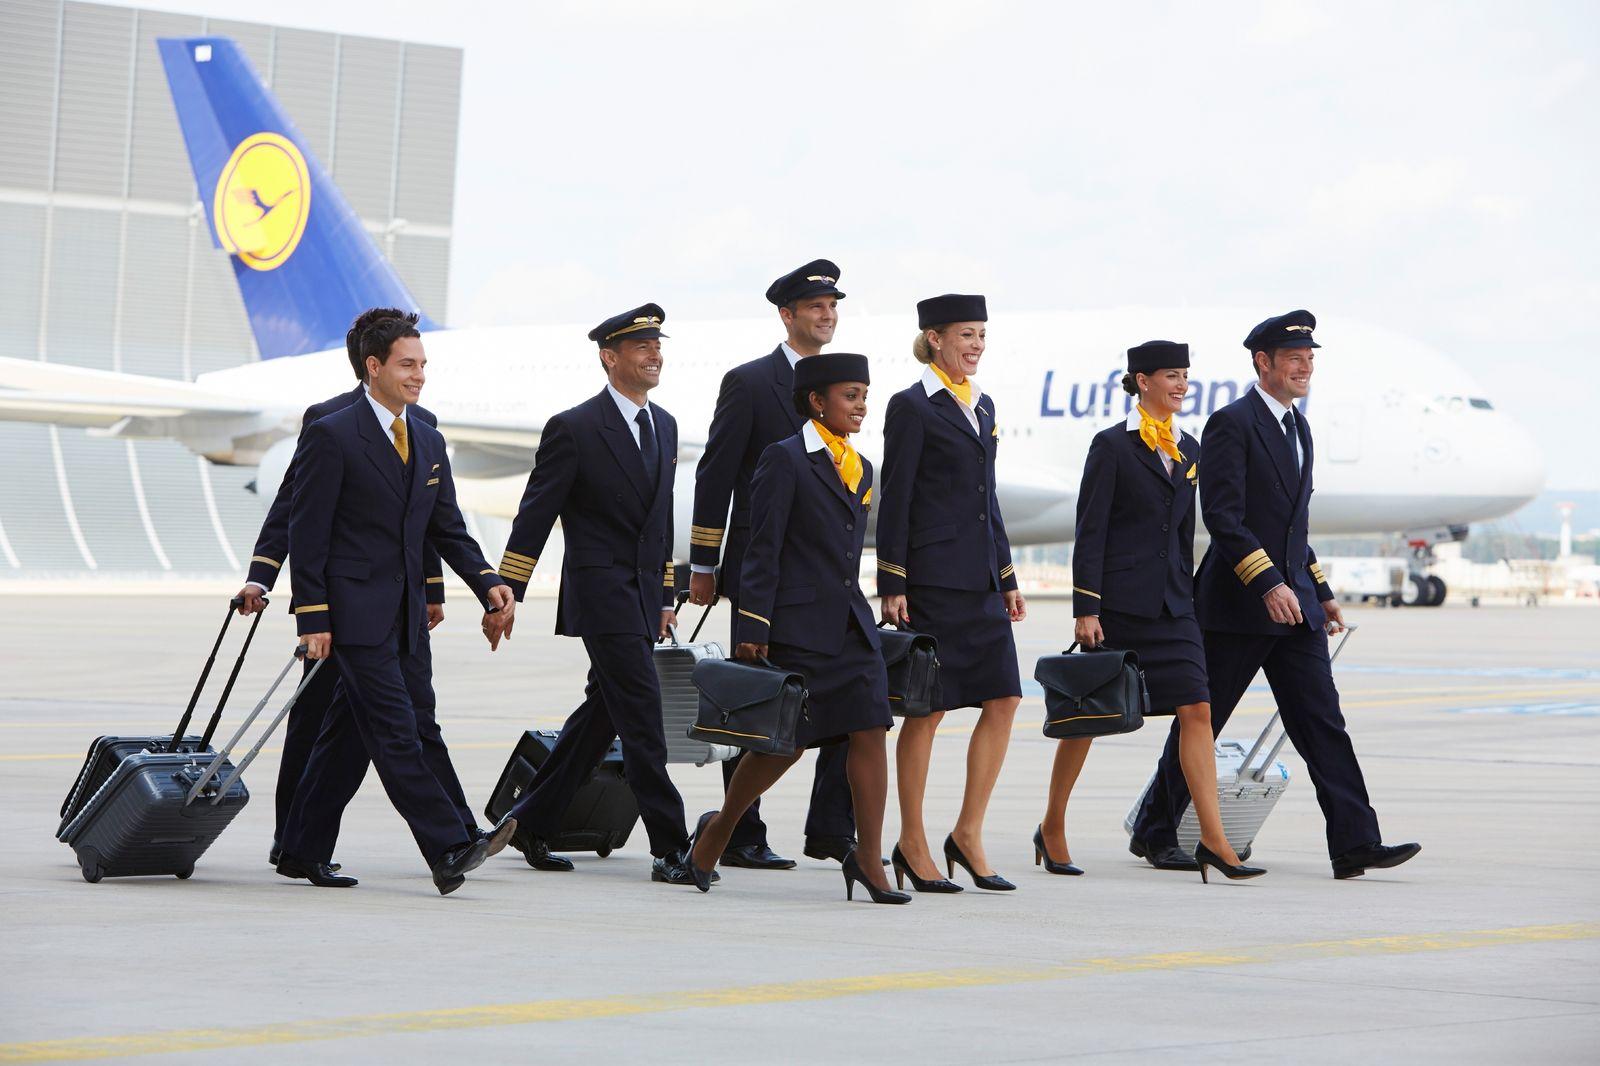 Lufthansa / Cockpit Crew